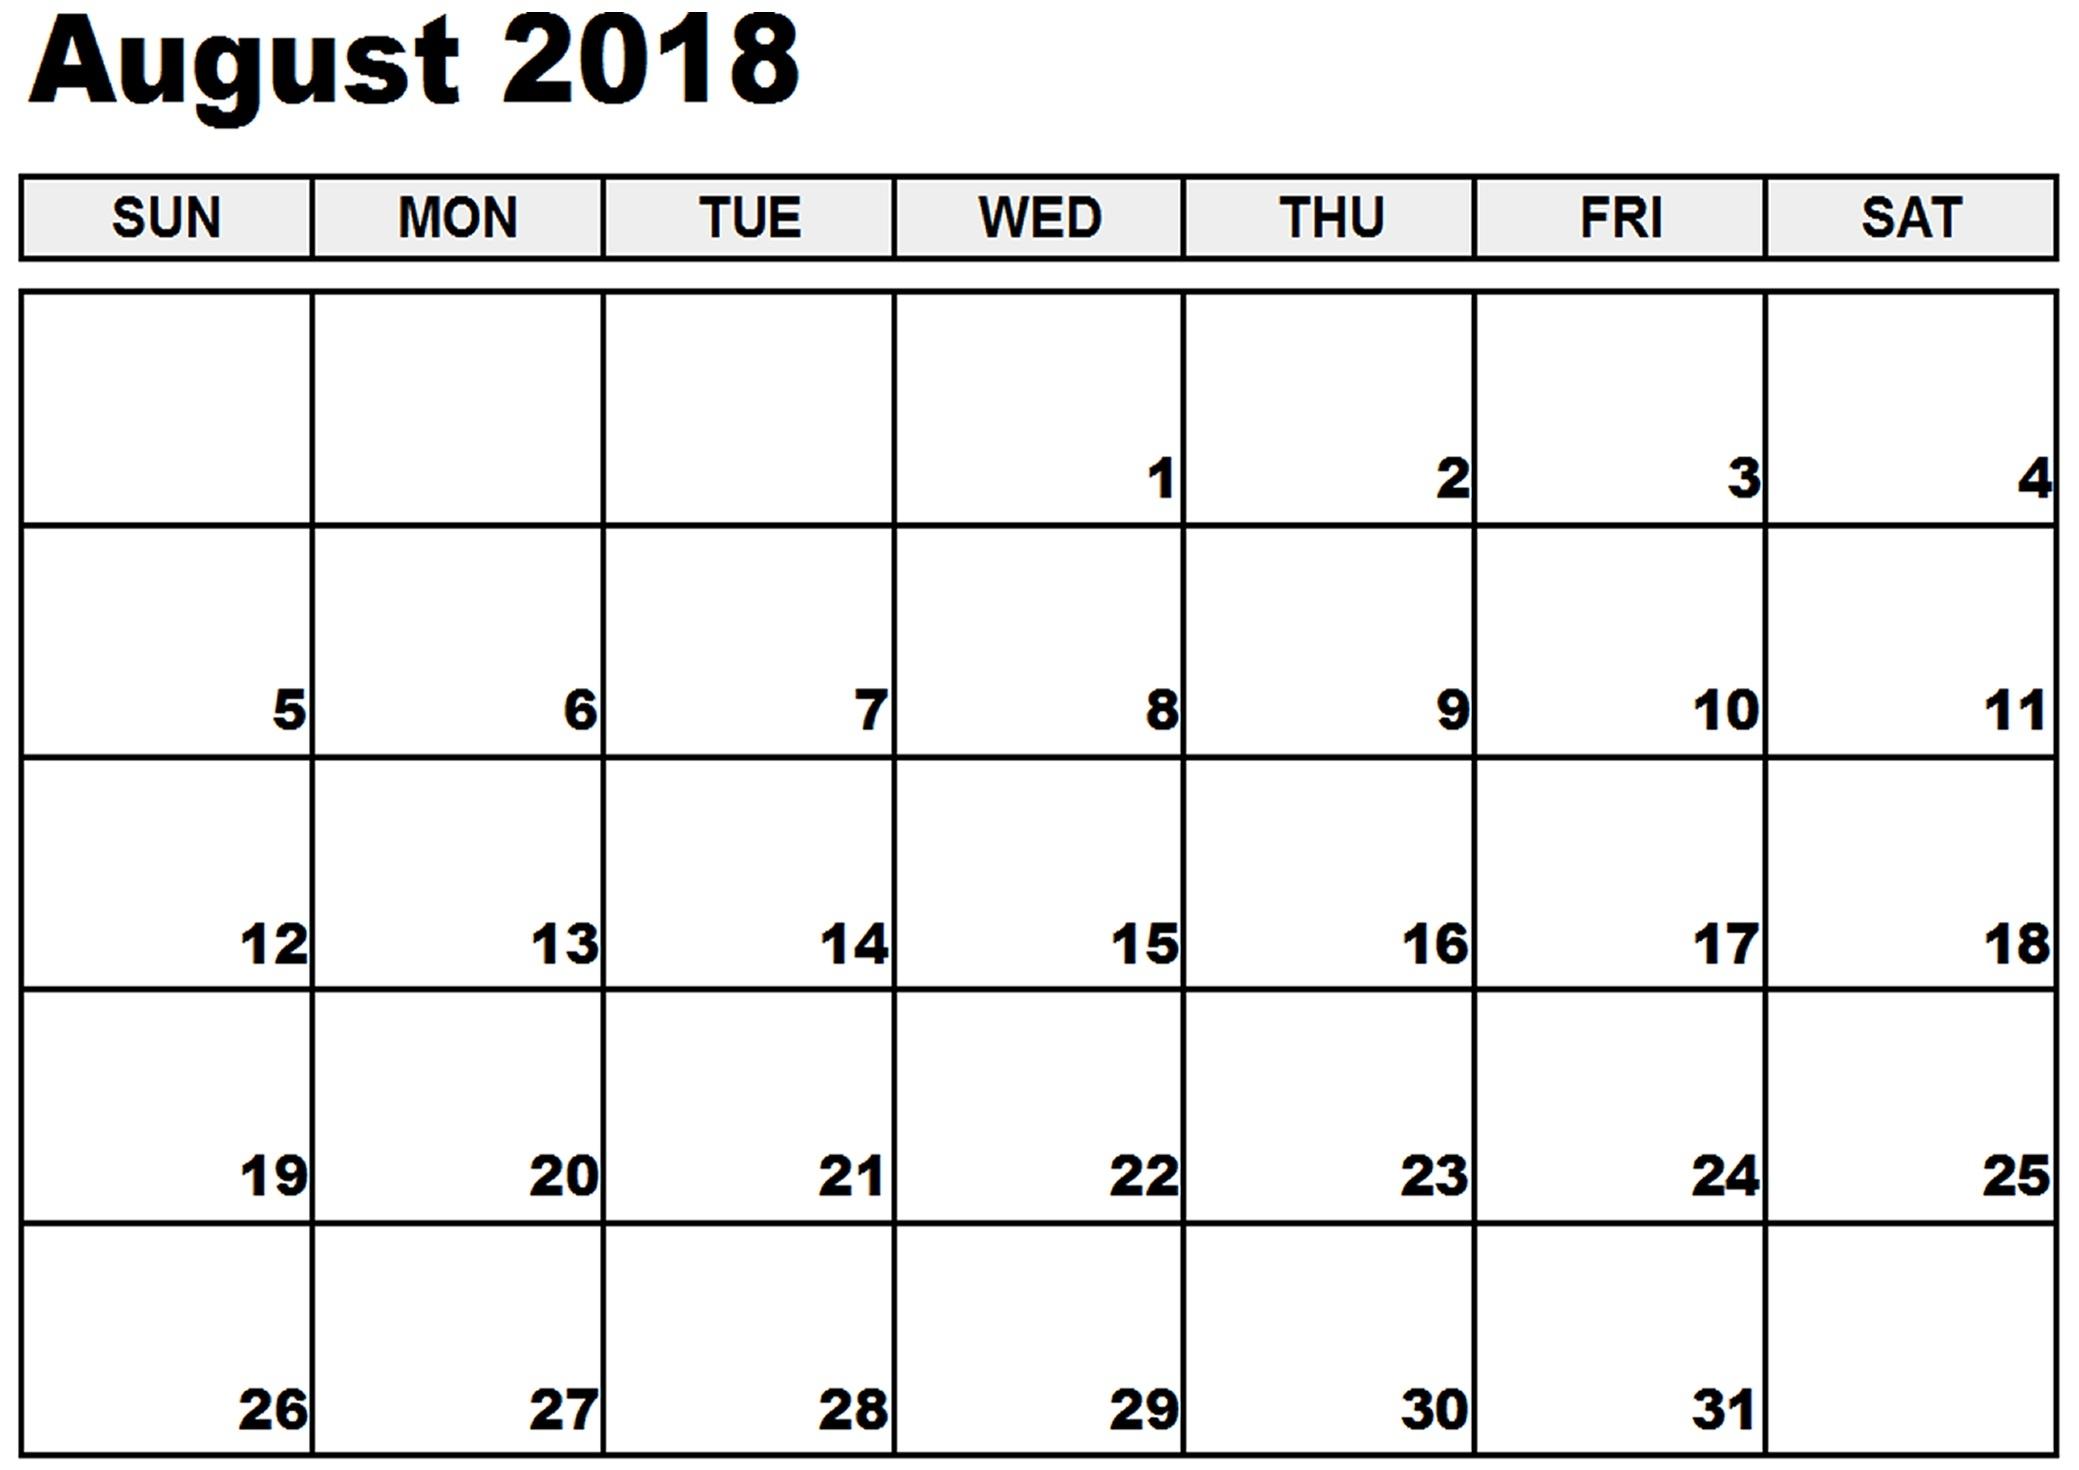 free download august calendar 2018 printable Free Pretty Printable Calendars August 2018 erdferdf